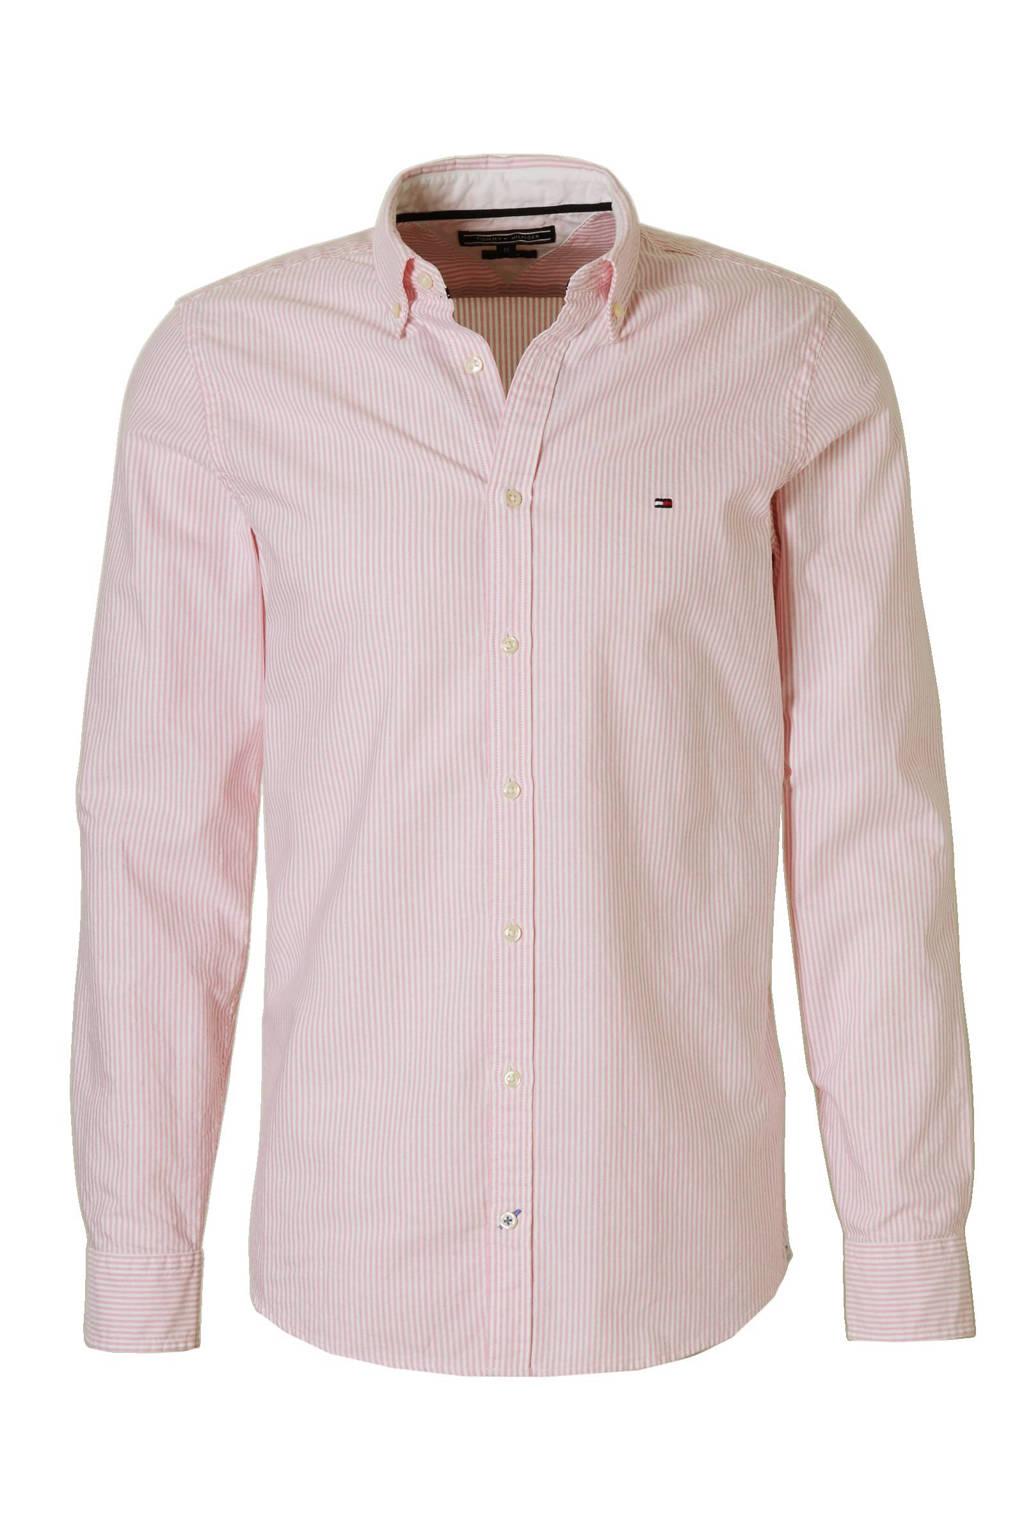 Heren Overhemd Roze.Tommy Hilfiger Ithaca Slim Fit Overhemd Wehkamp